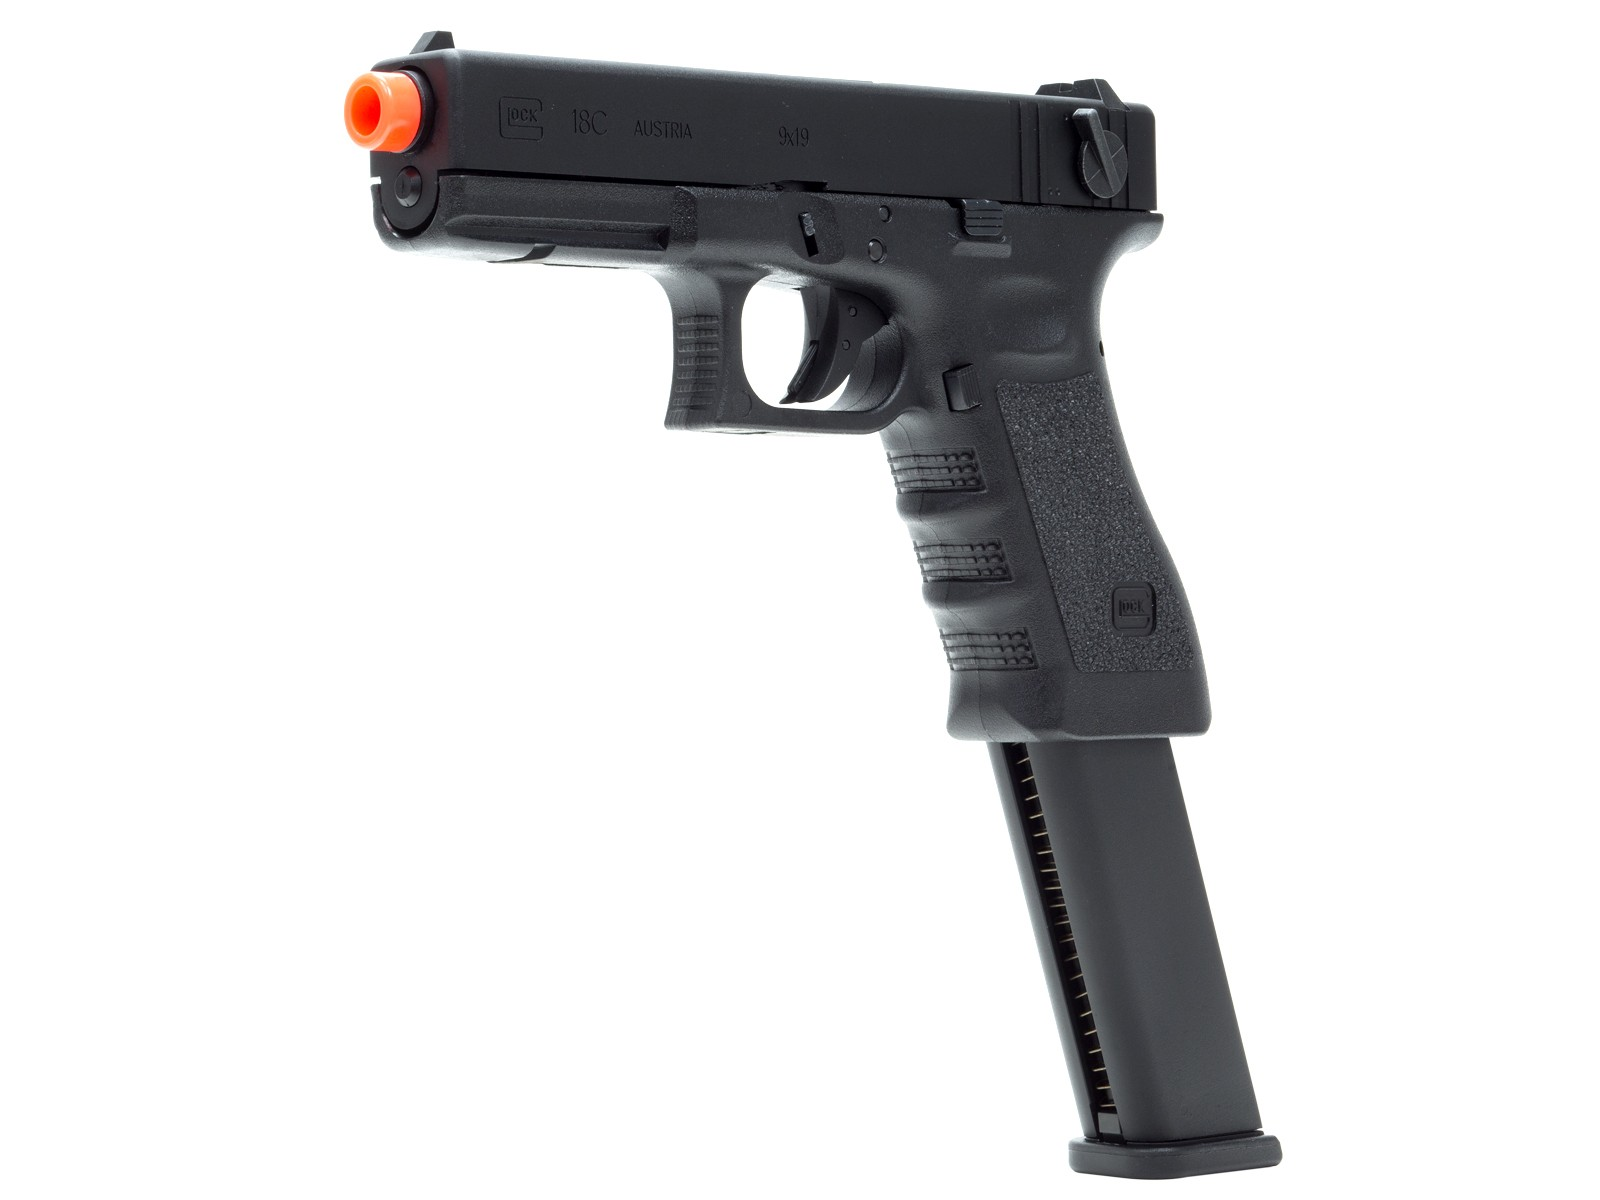 GLOCK G18C Gen3 GBB Airsoft Pistol w/ Extended Mag